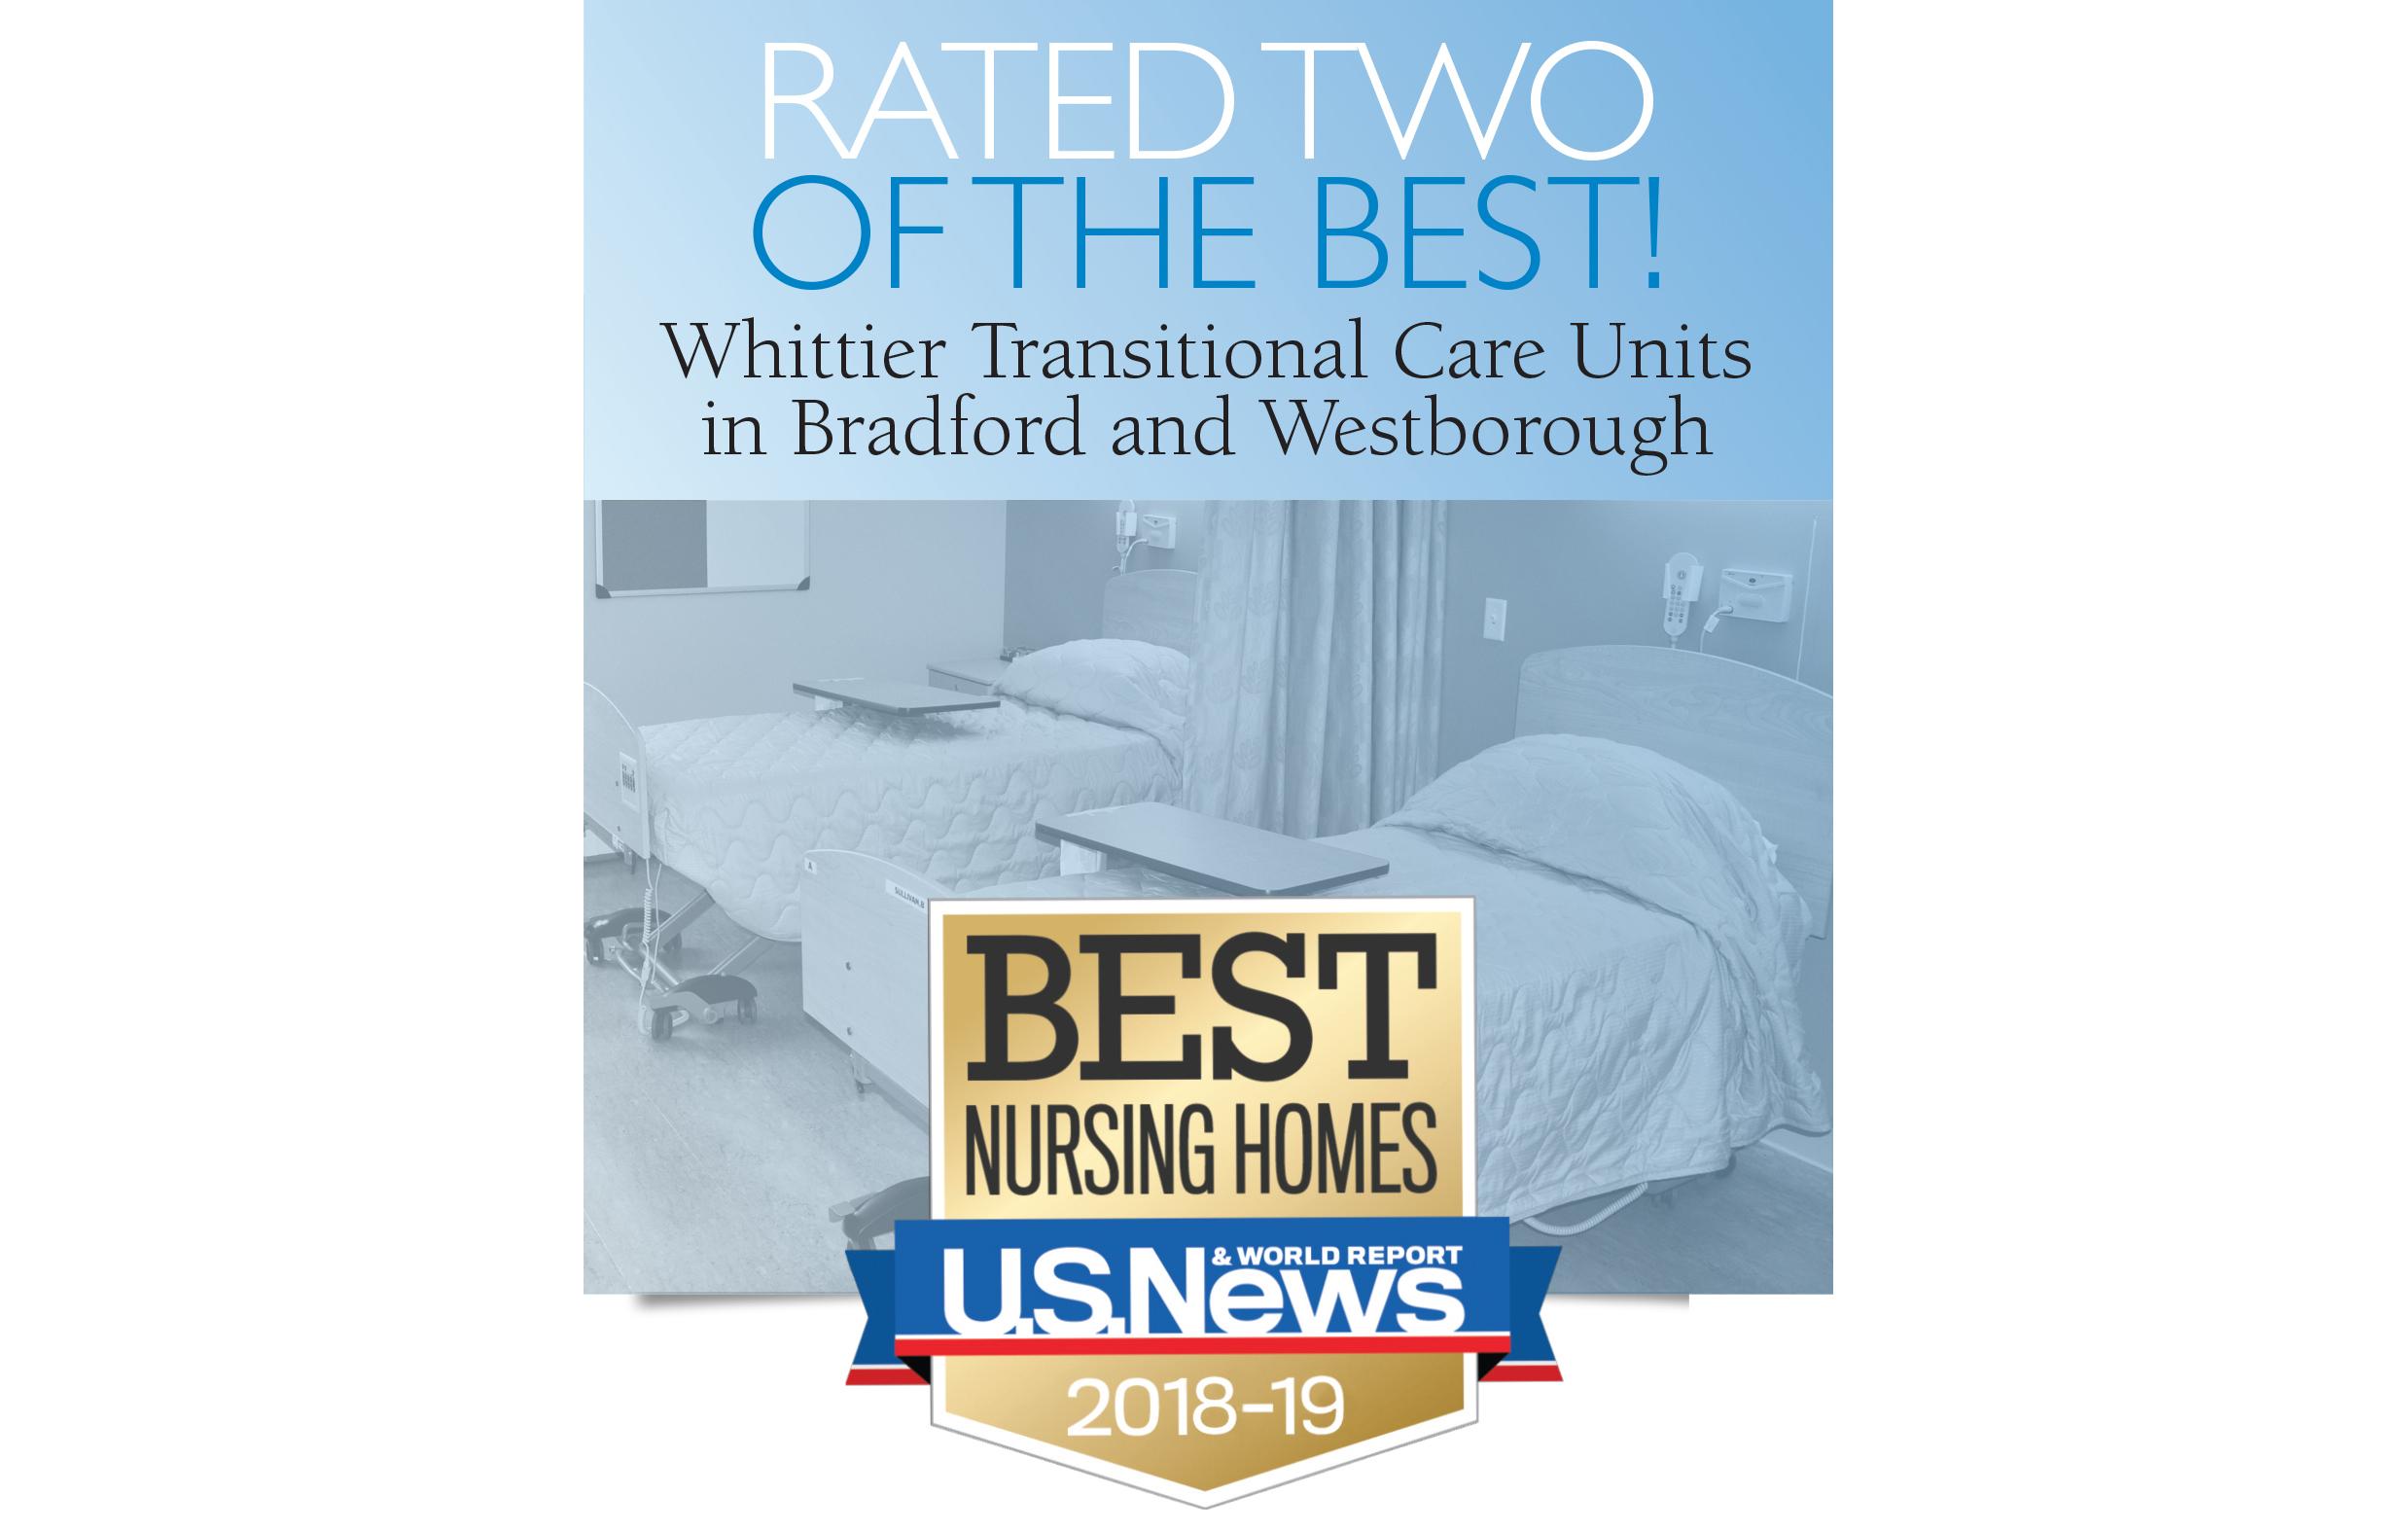 """Best Nursing Homes"" - U.S. News & World Report listing"